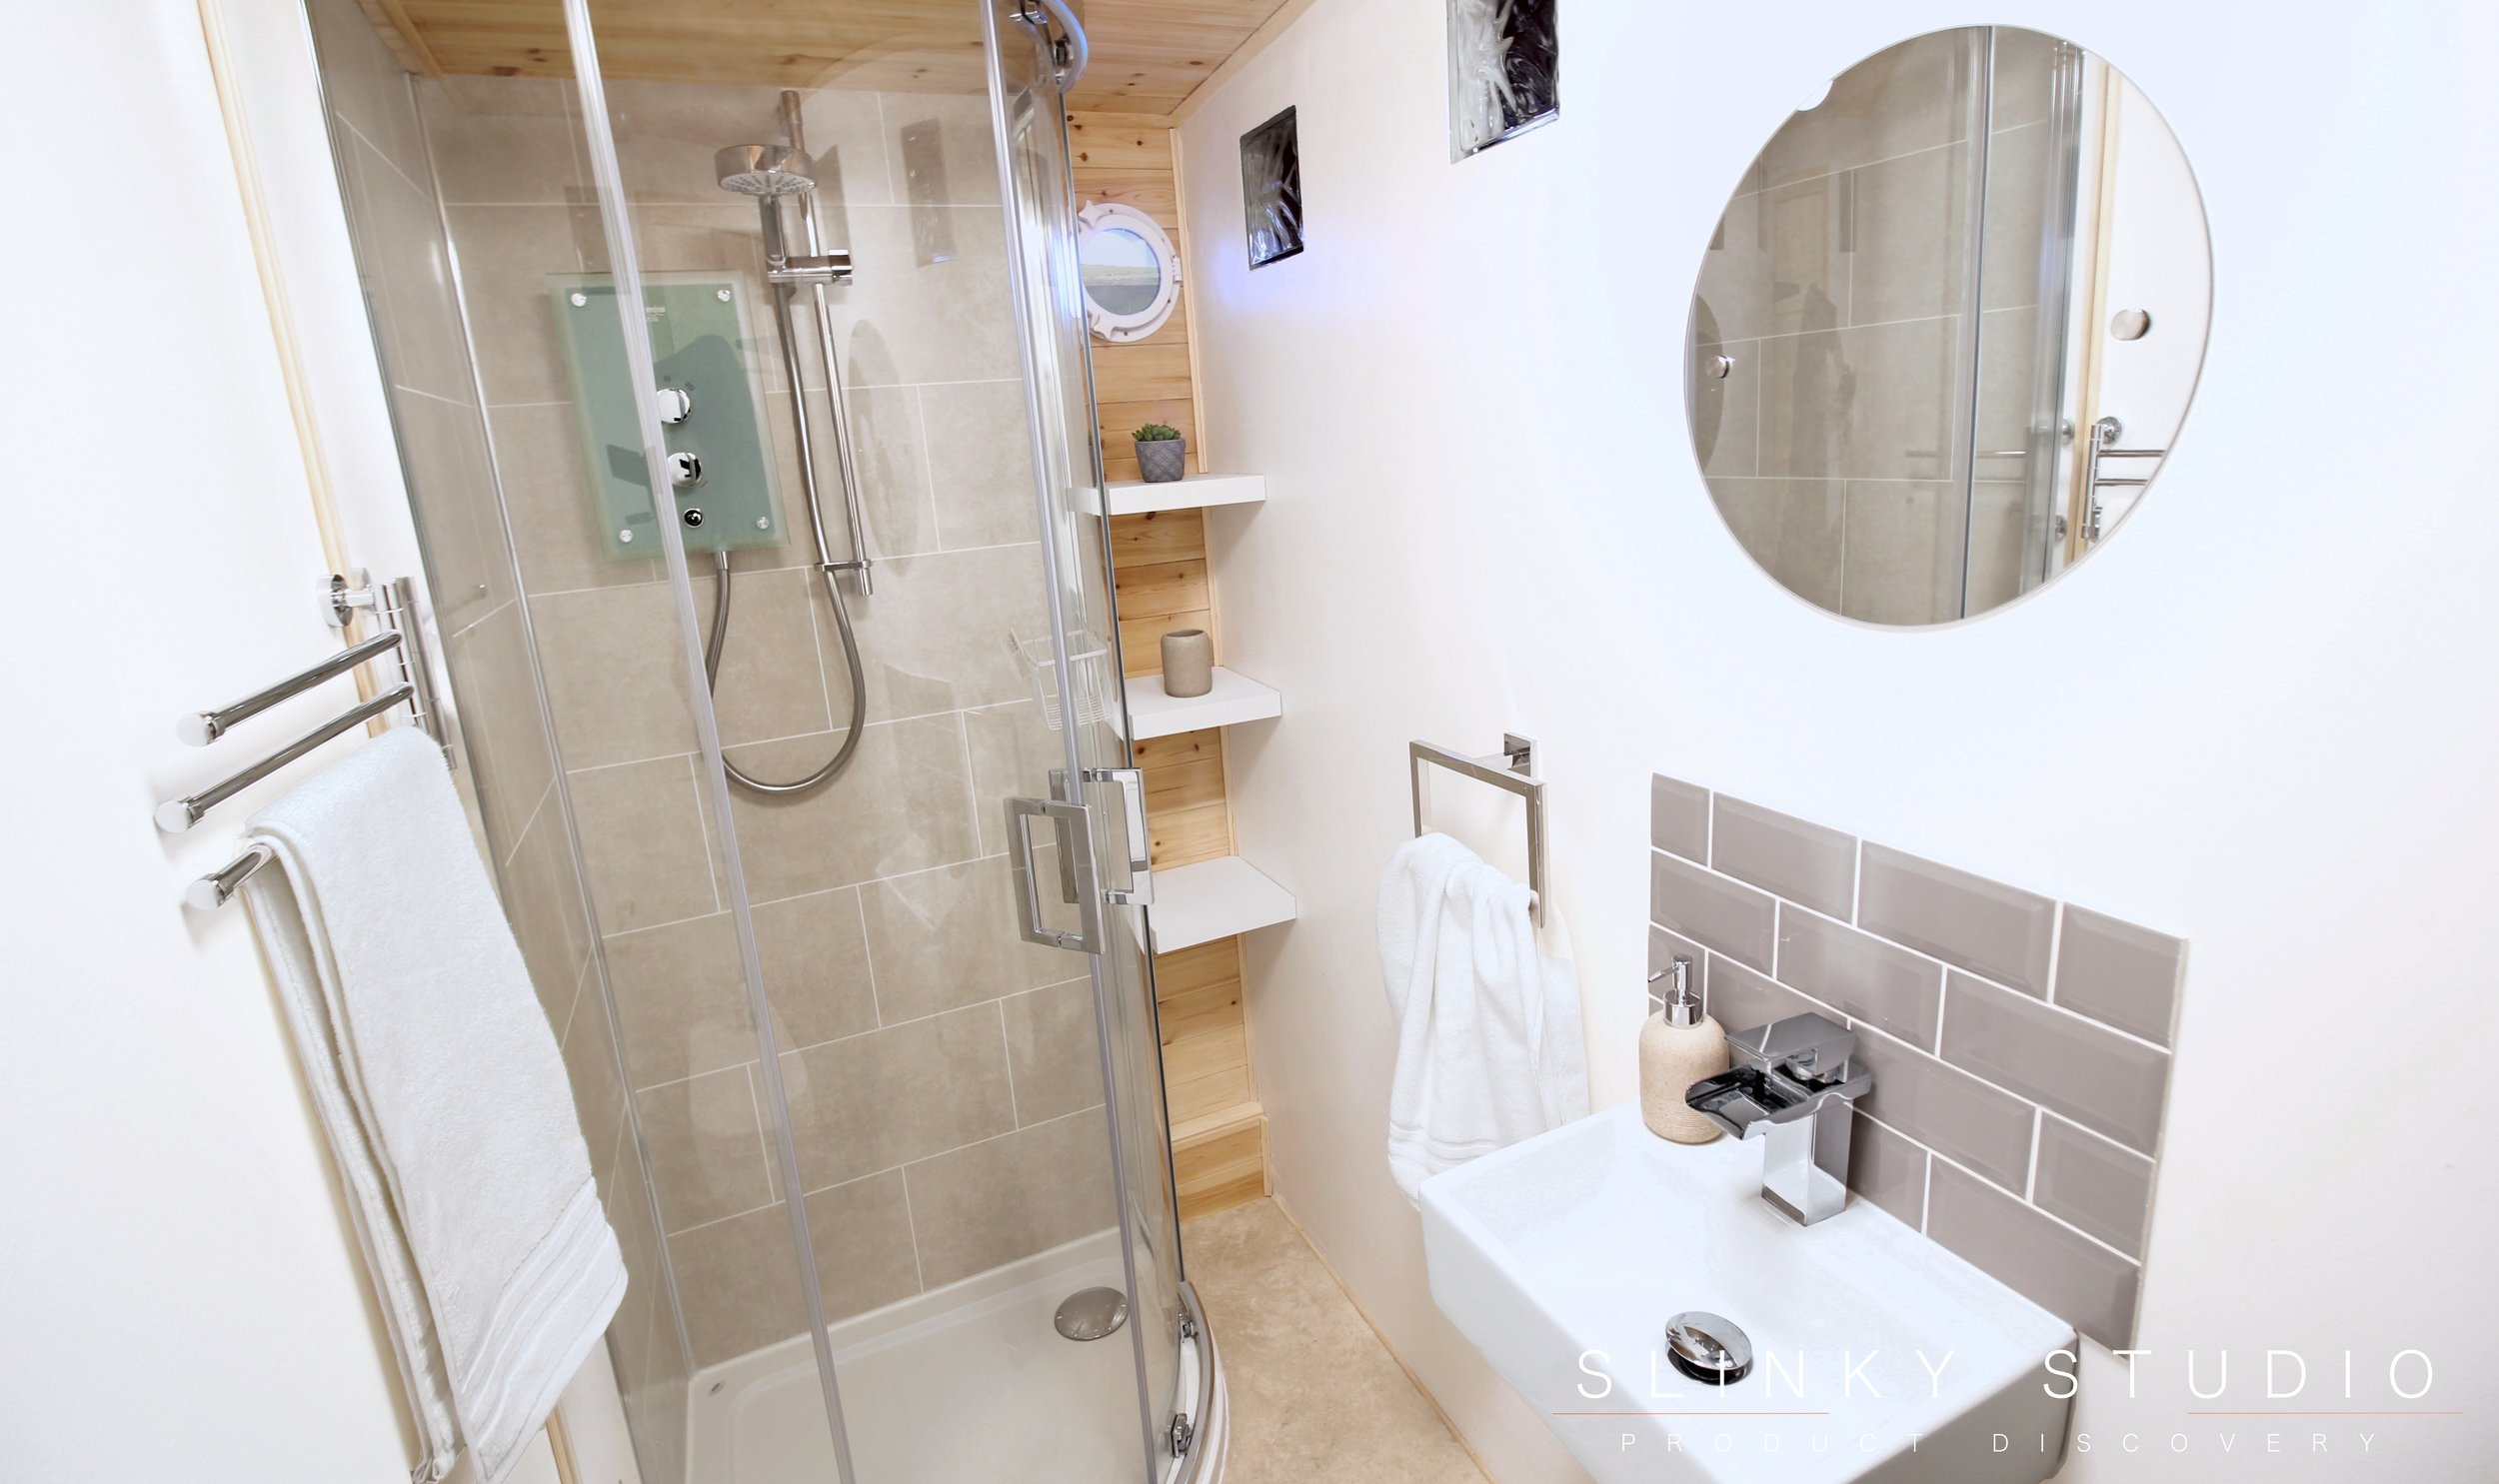 Mira Leap Quadrant Shower Scandi Wooden Bathroom.jpg